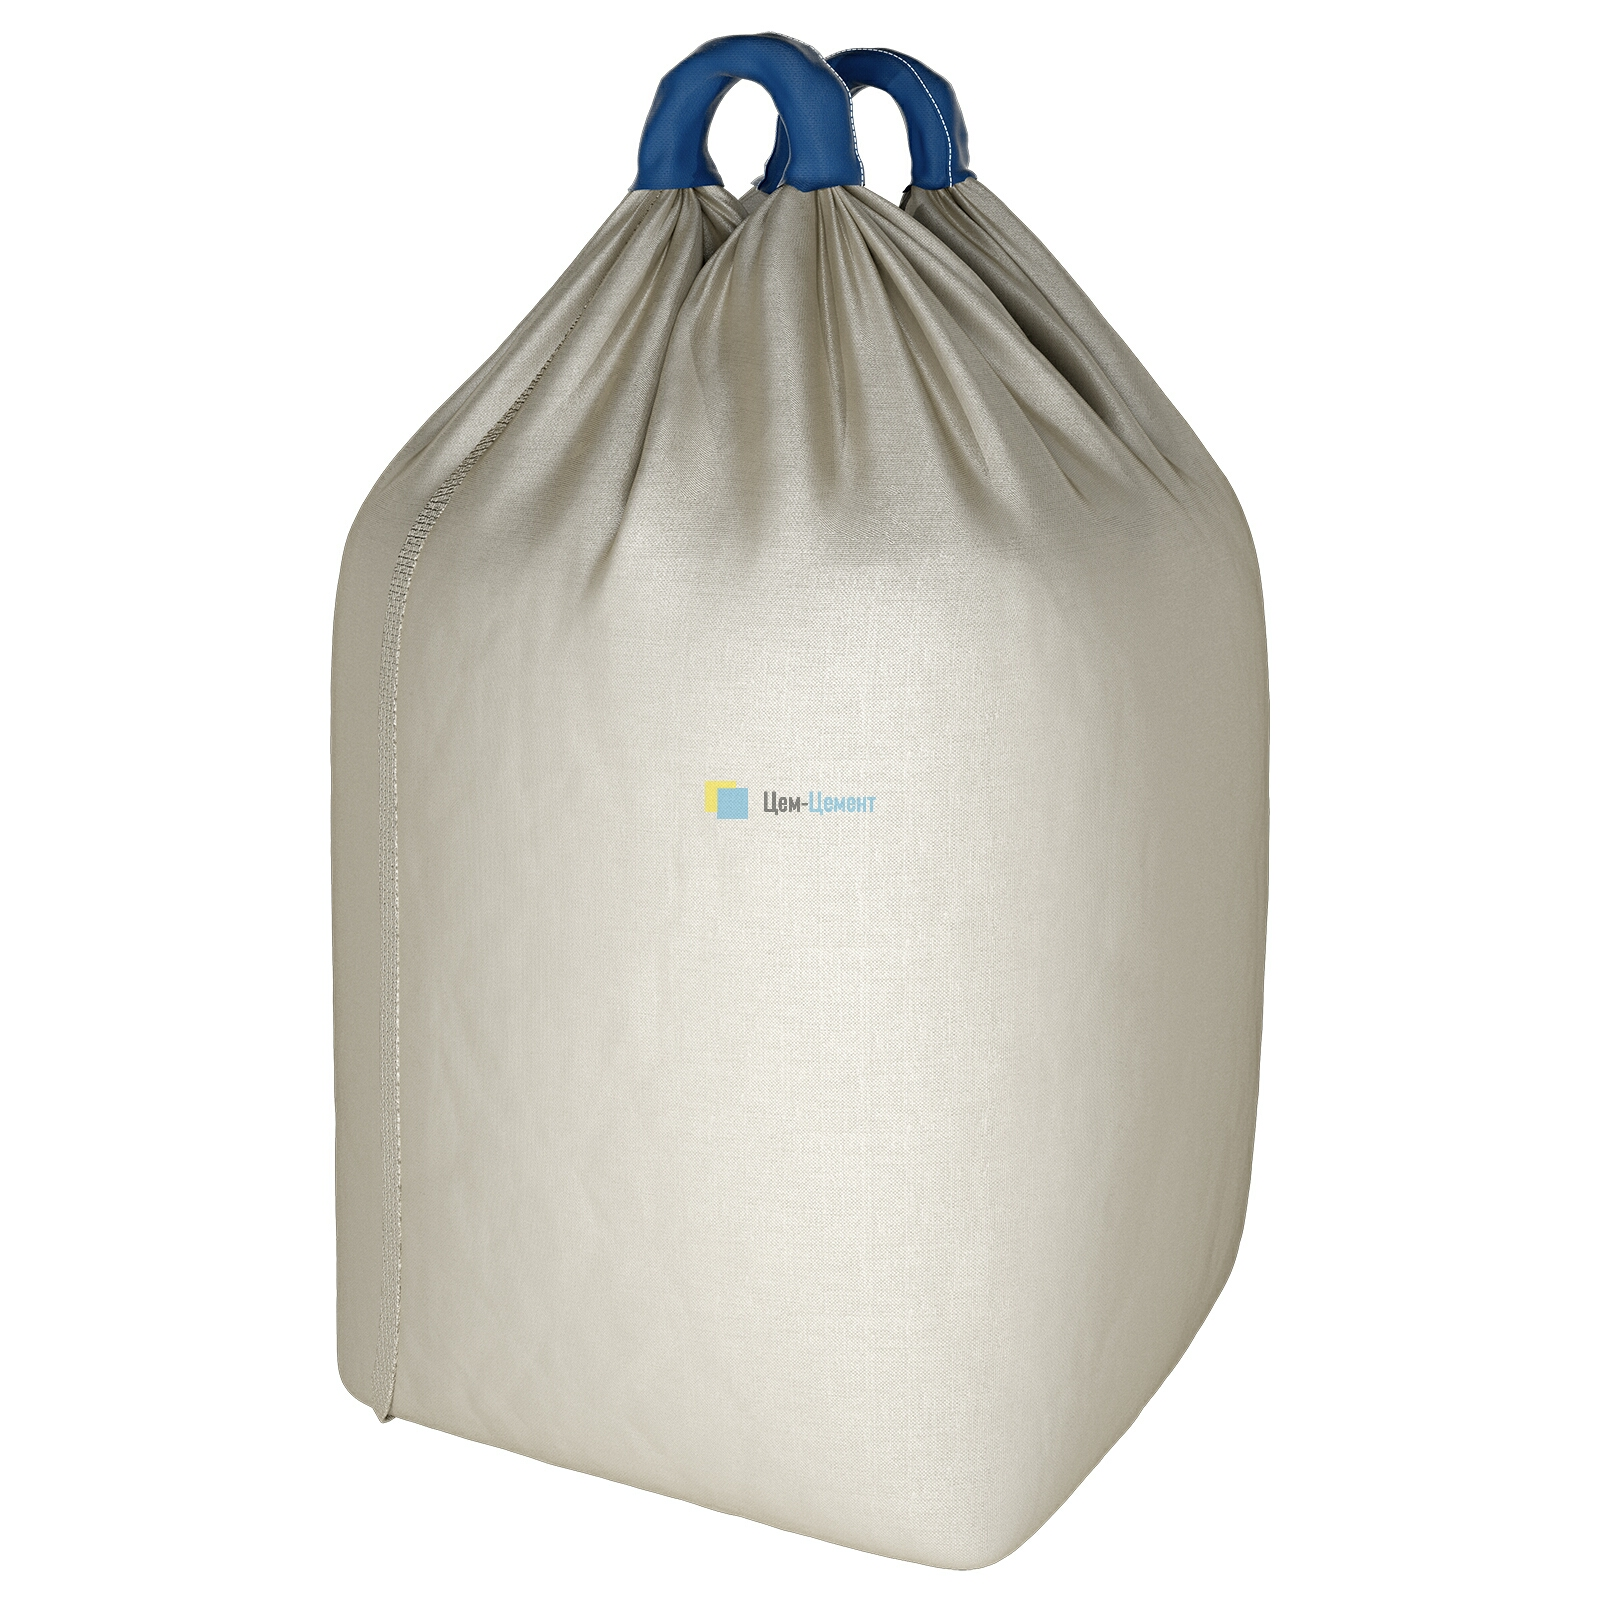 Производство биг бэгов (мягких контейнеров) от компании «пласткон»